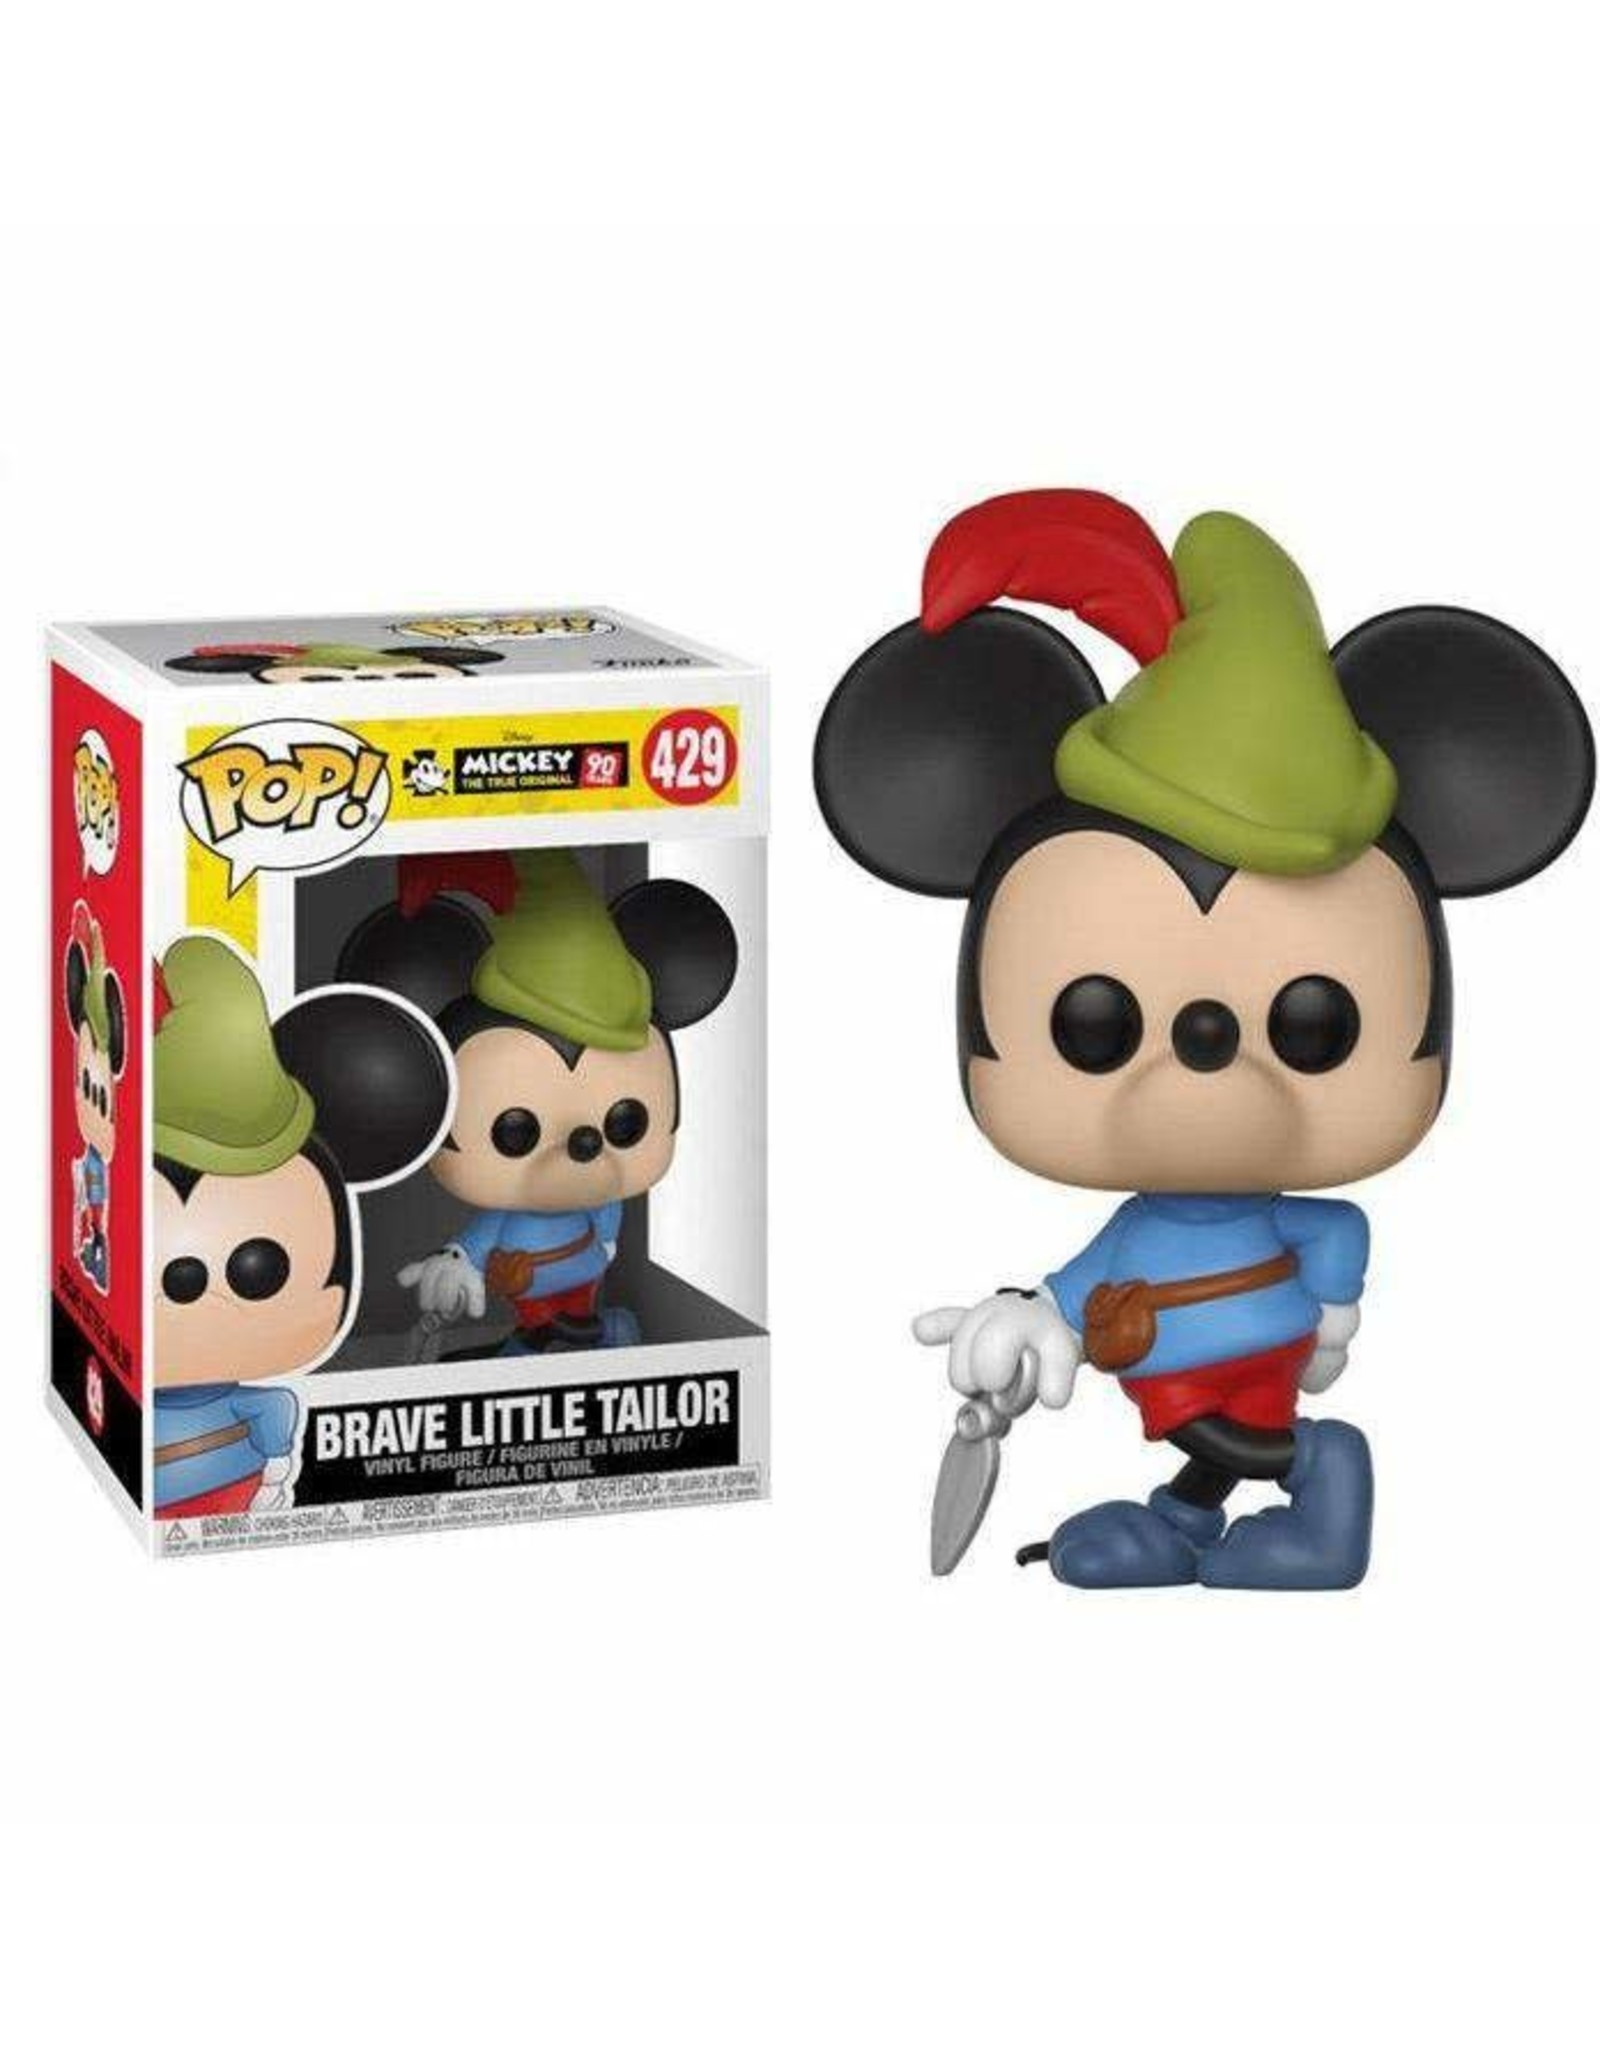 Funko Pop! Funko Pop! Disney nr429 Brave Little Tailor